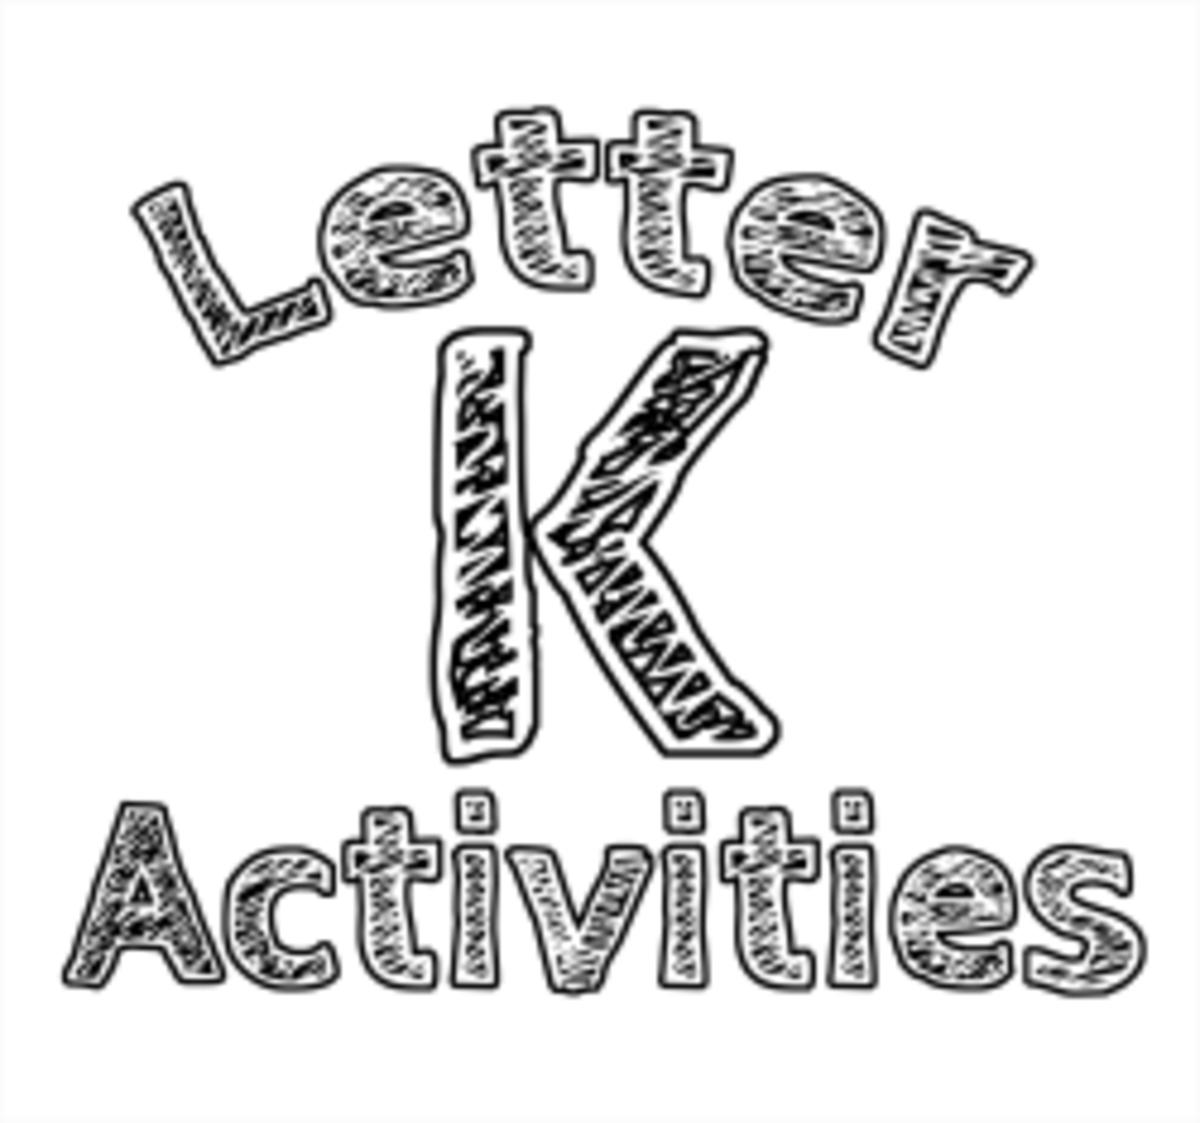 letter-k-alphabet-activities-for-kids